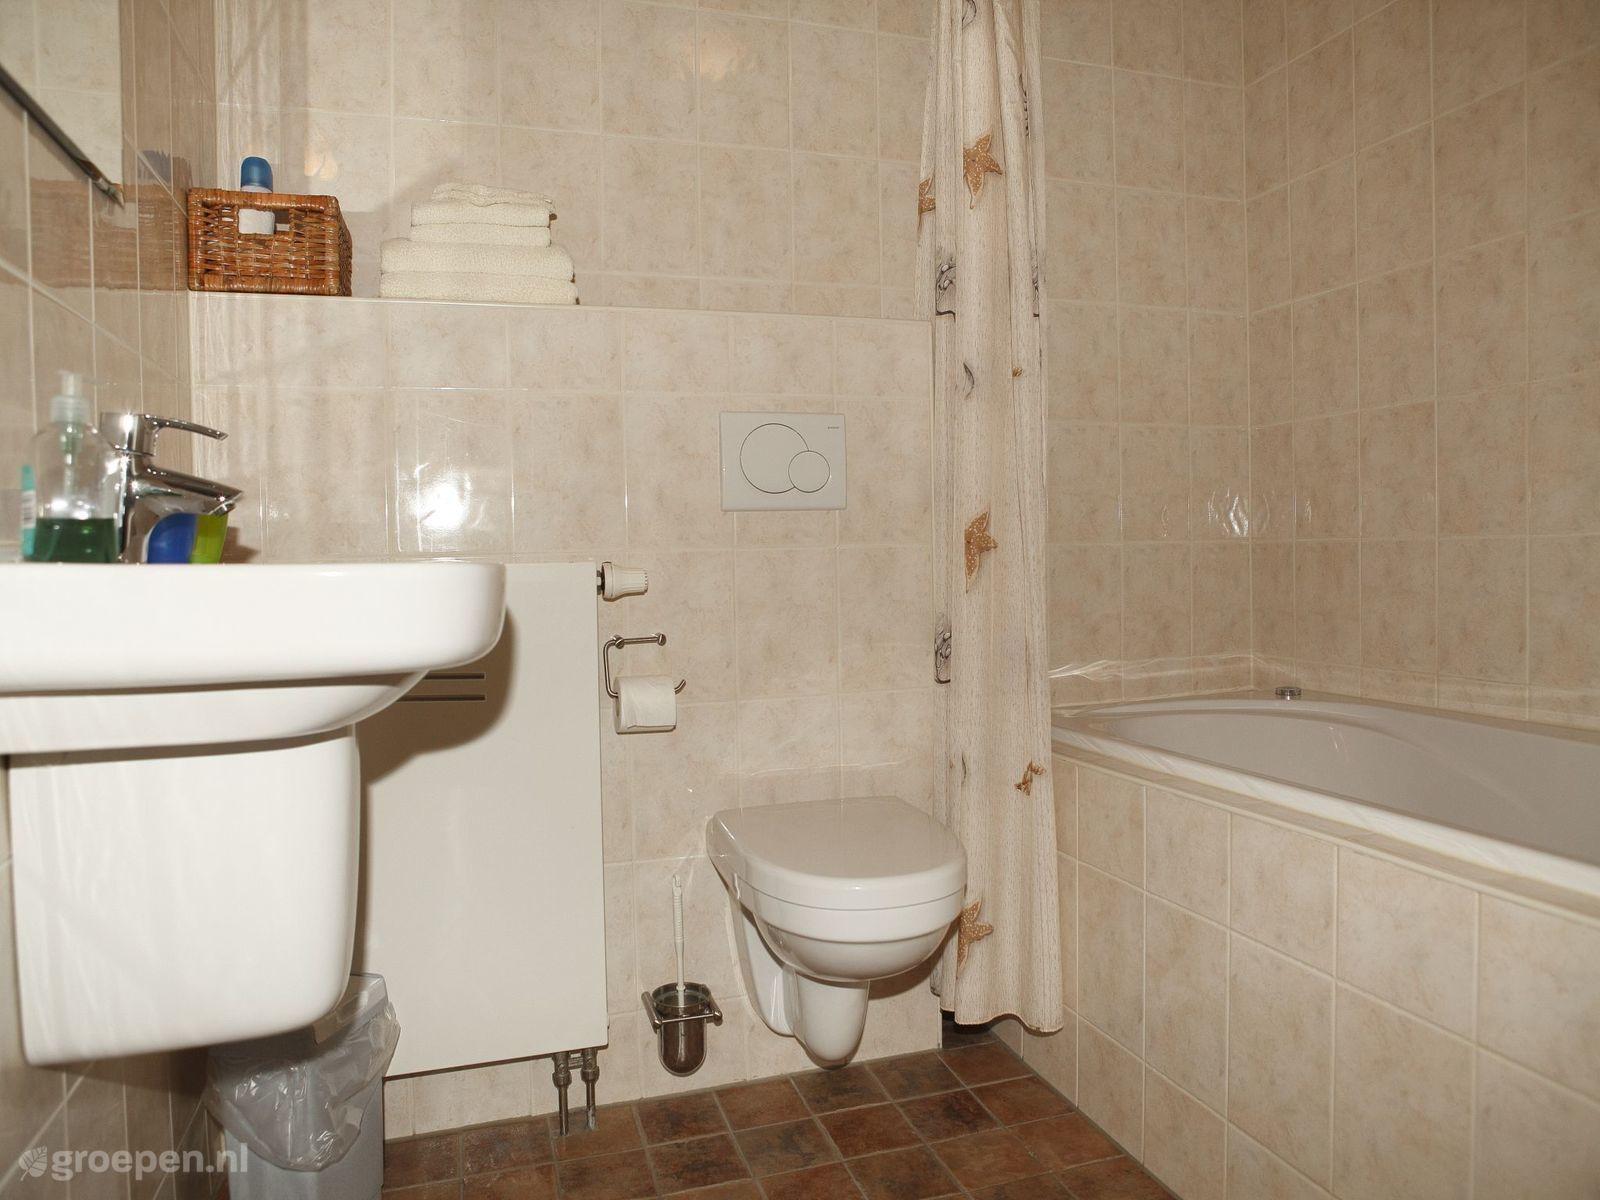 Group accommodation Woudenberg